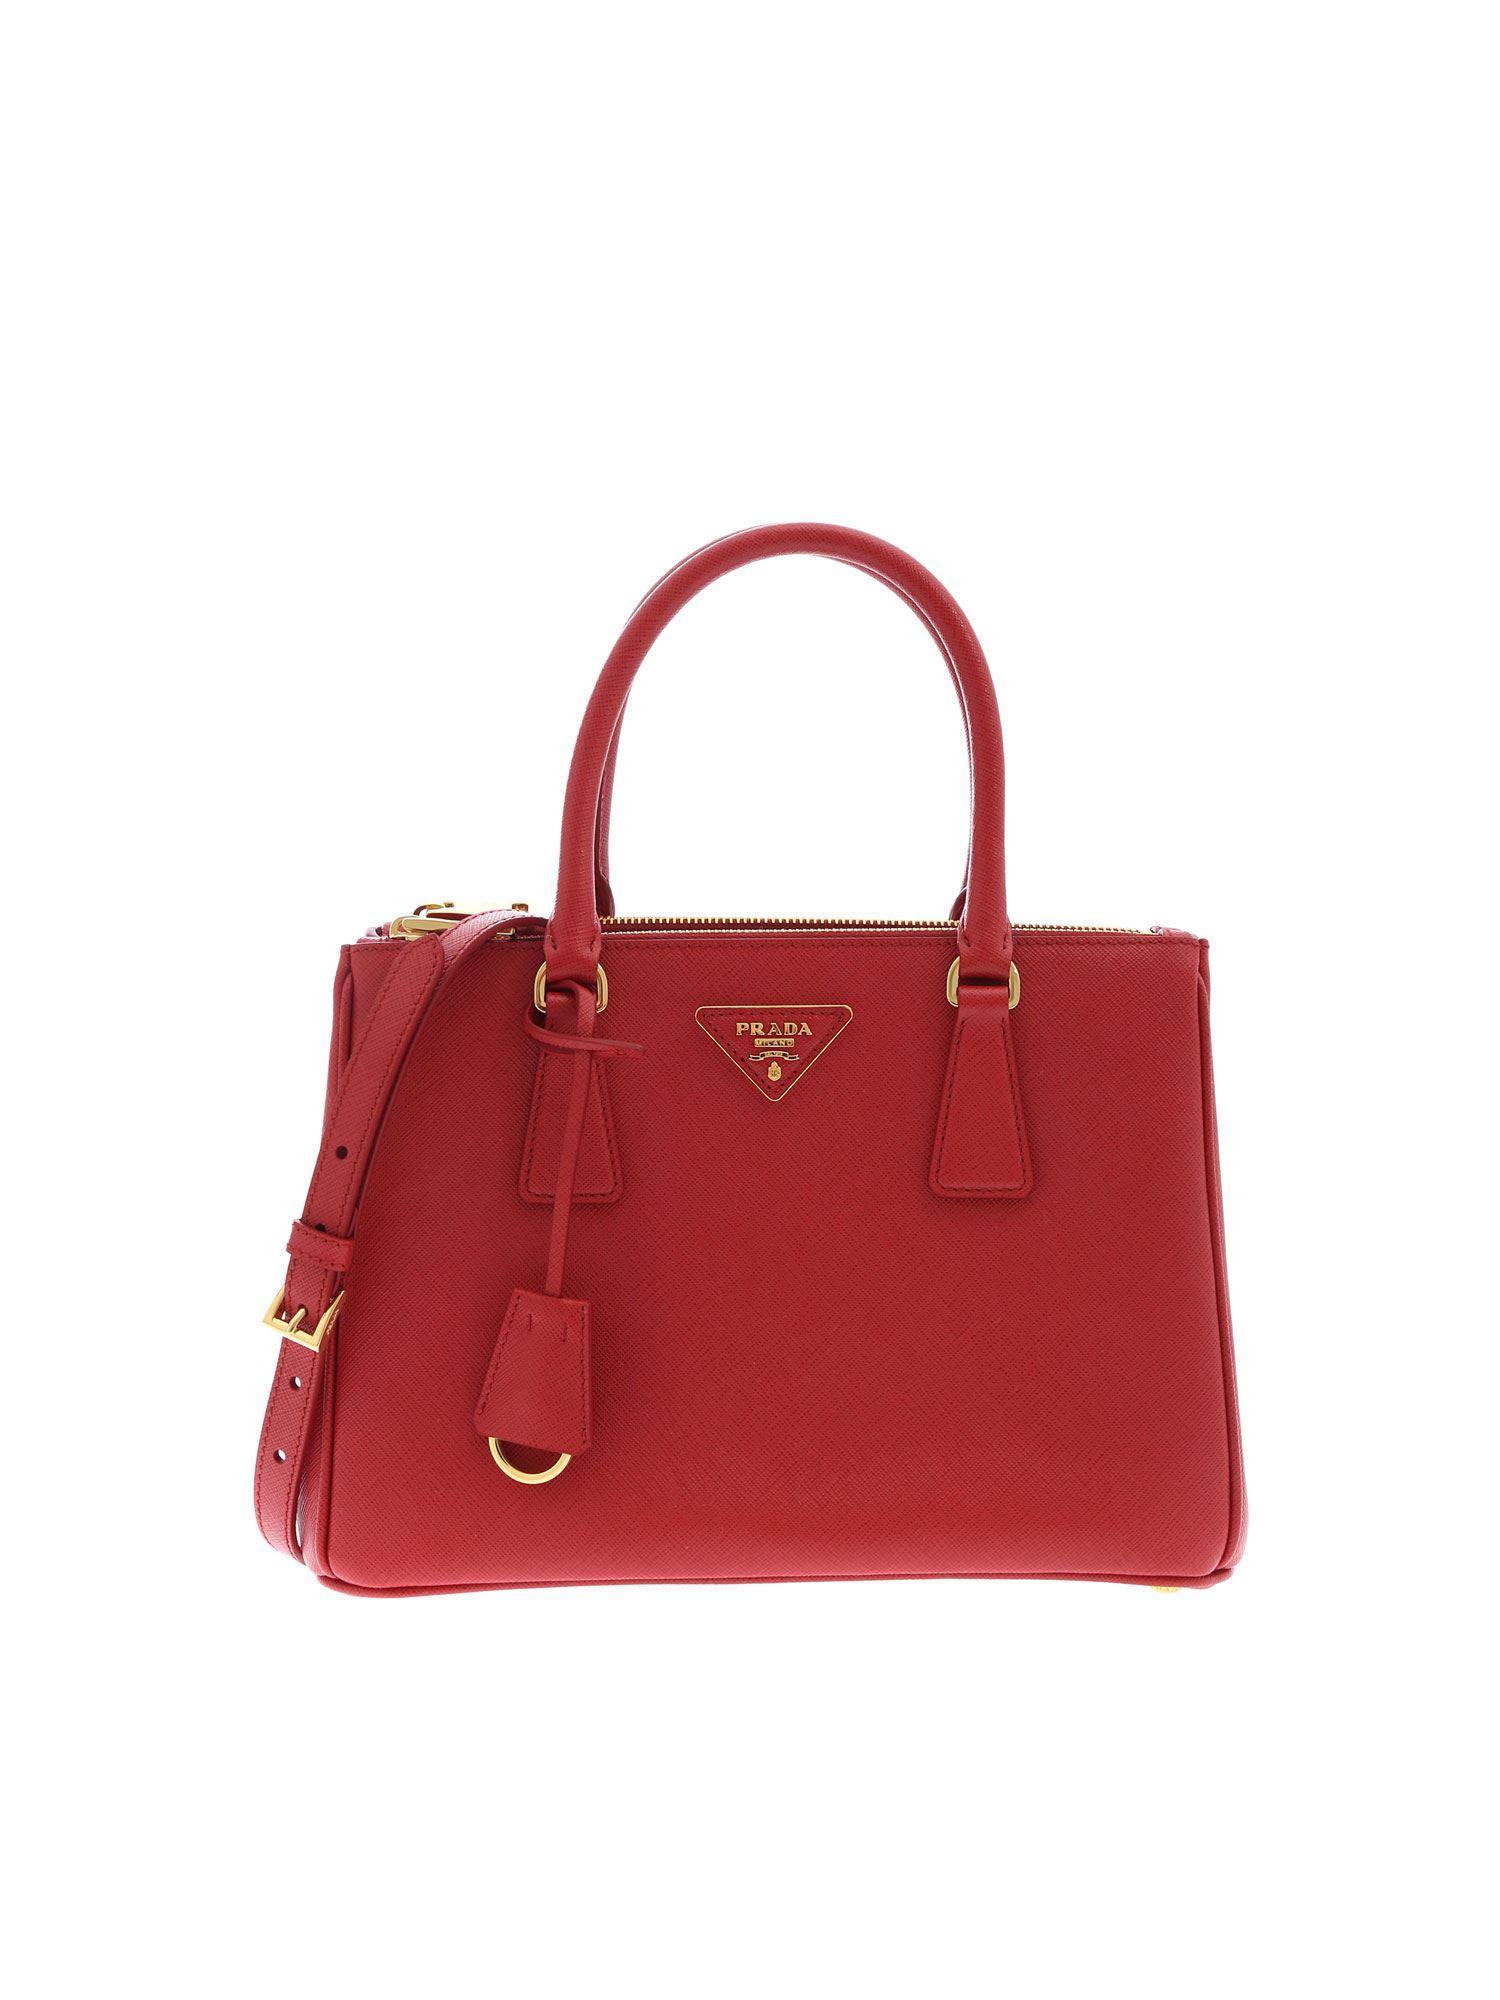 c2ed3d34d793de Prada - Galleria Small Crossbody Bag In Red - Lyst. View fullscreen